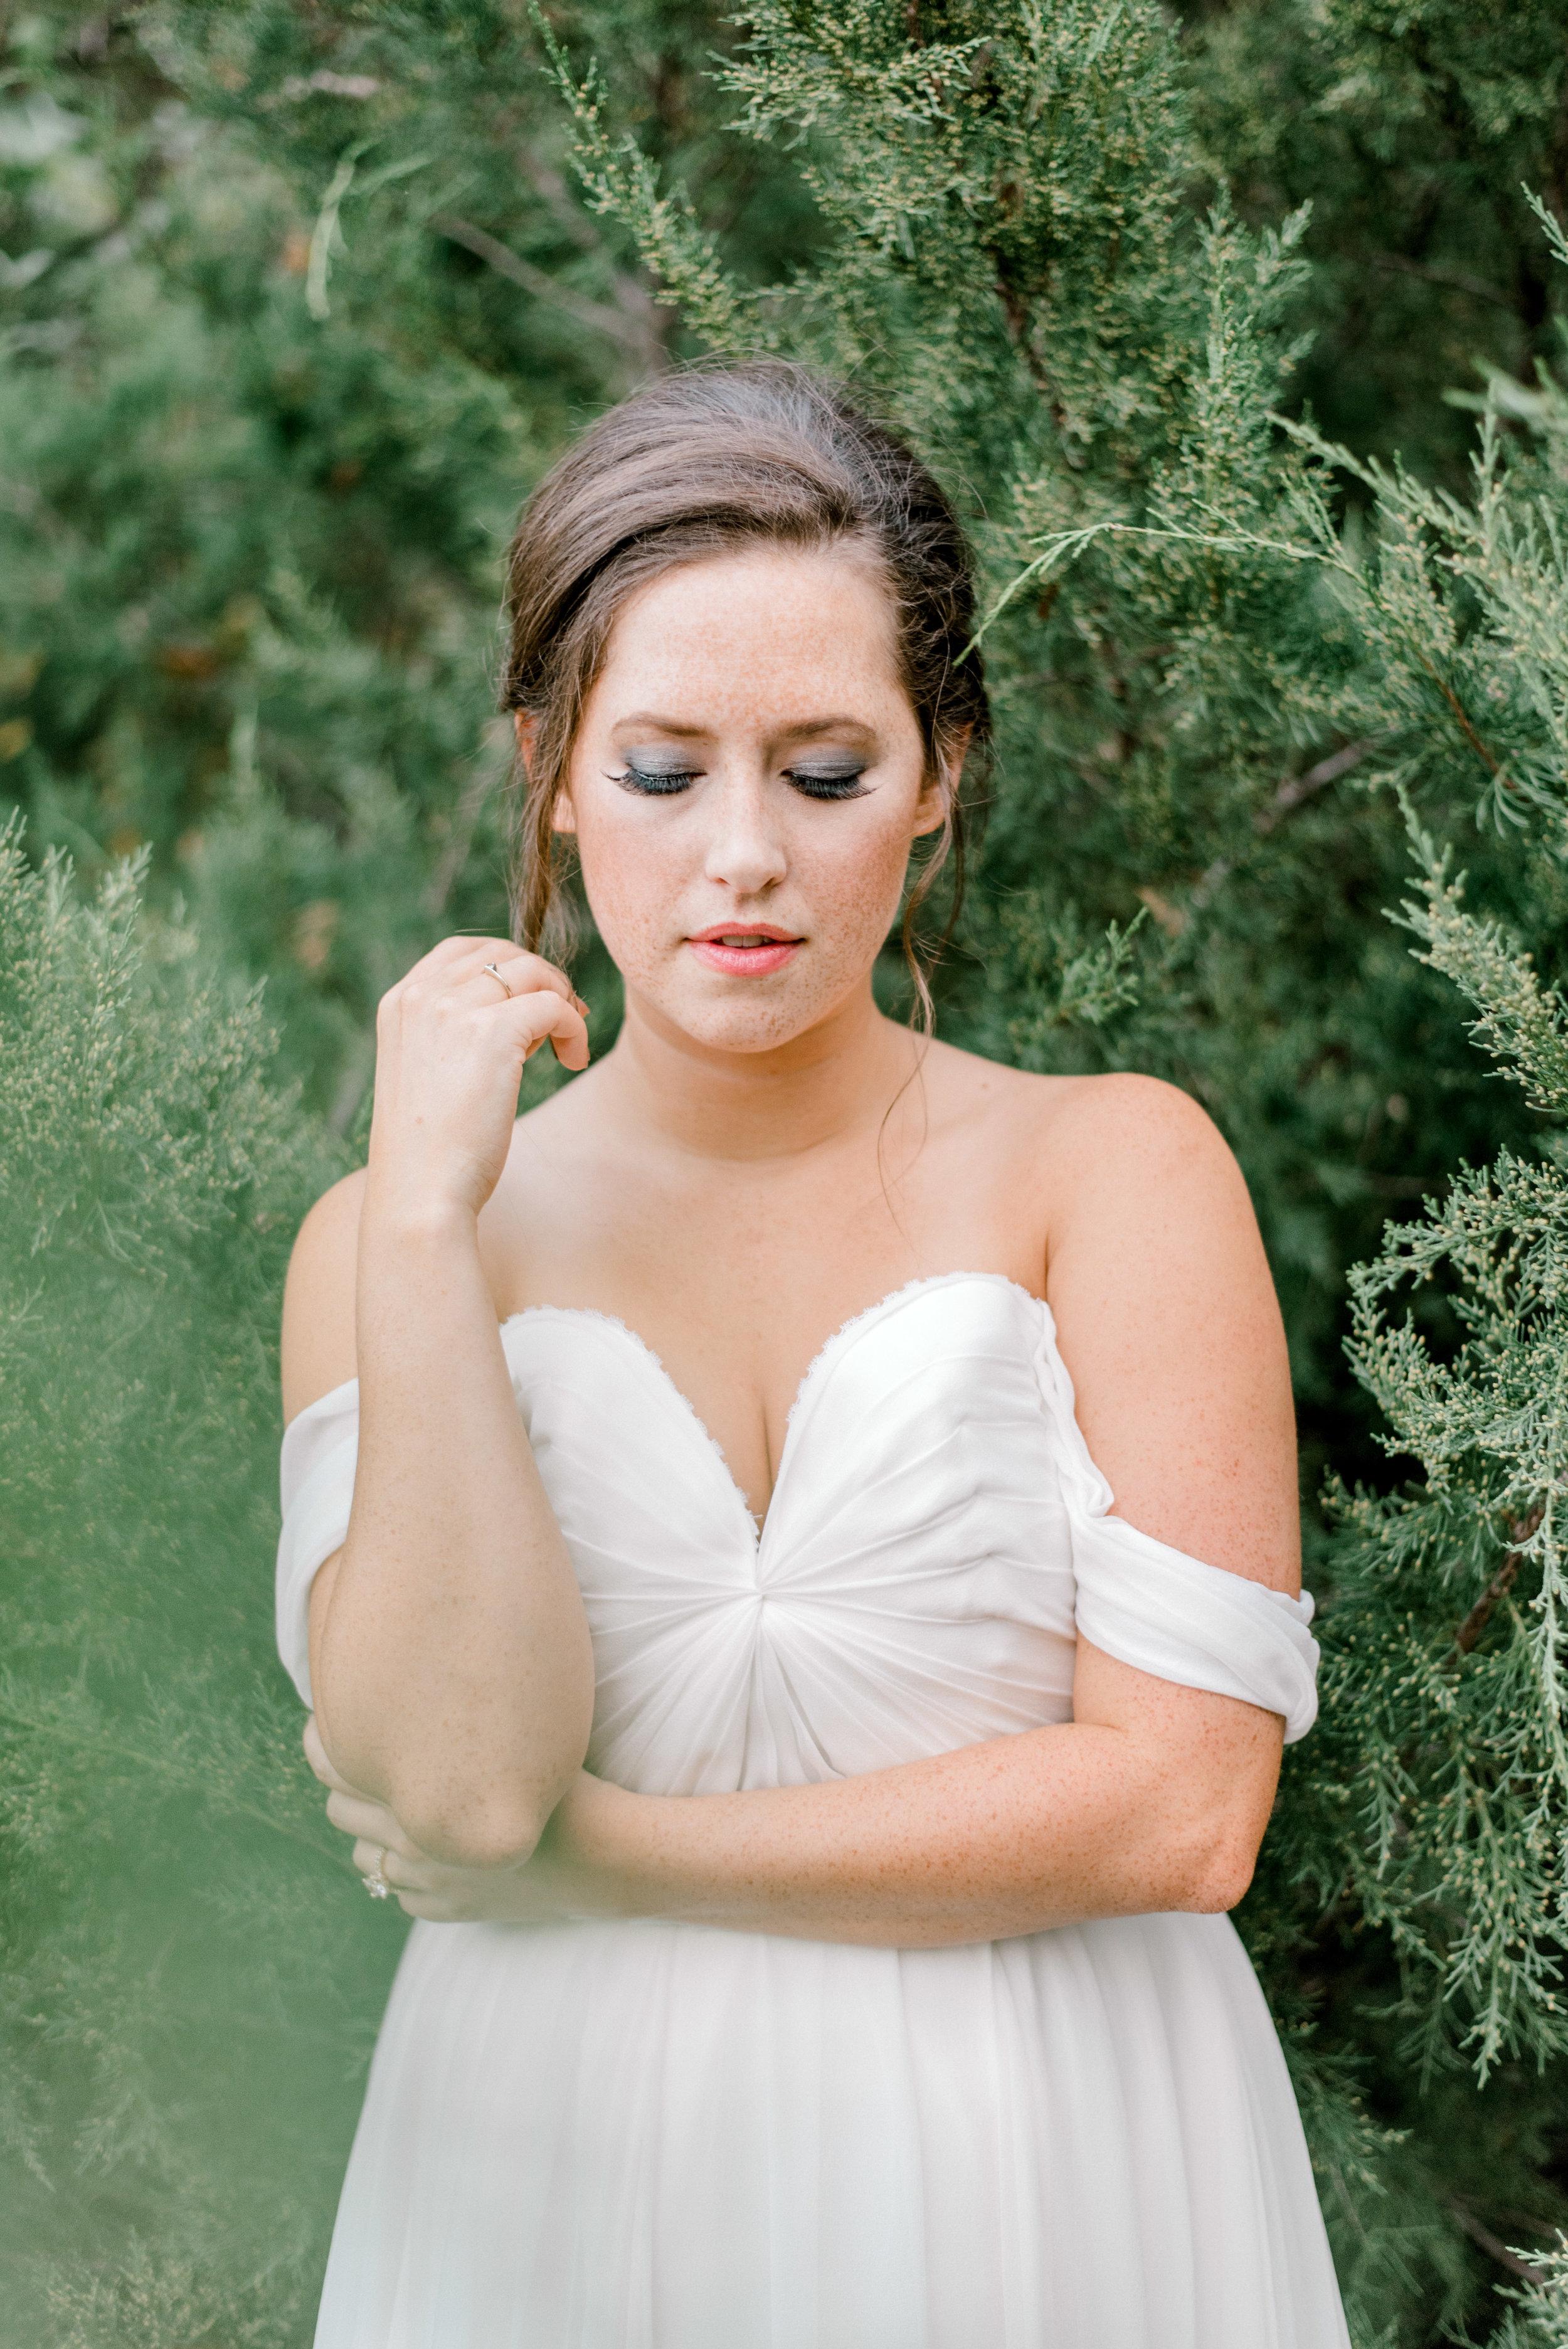 gray-door-photography-wedding-photographer-steph-erffmeyer-dallas-destination-bridal1.jpg